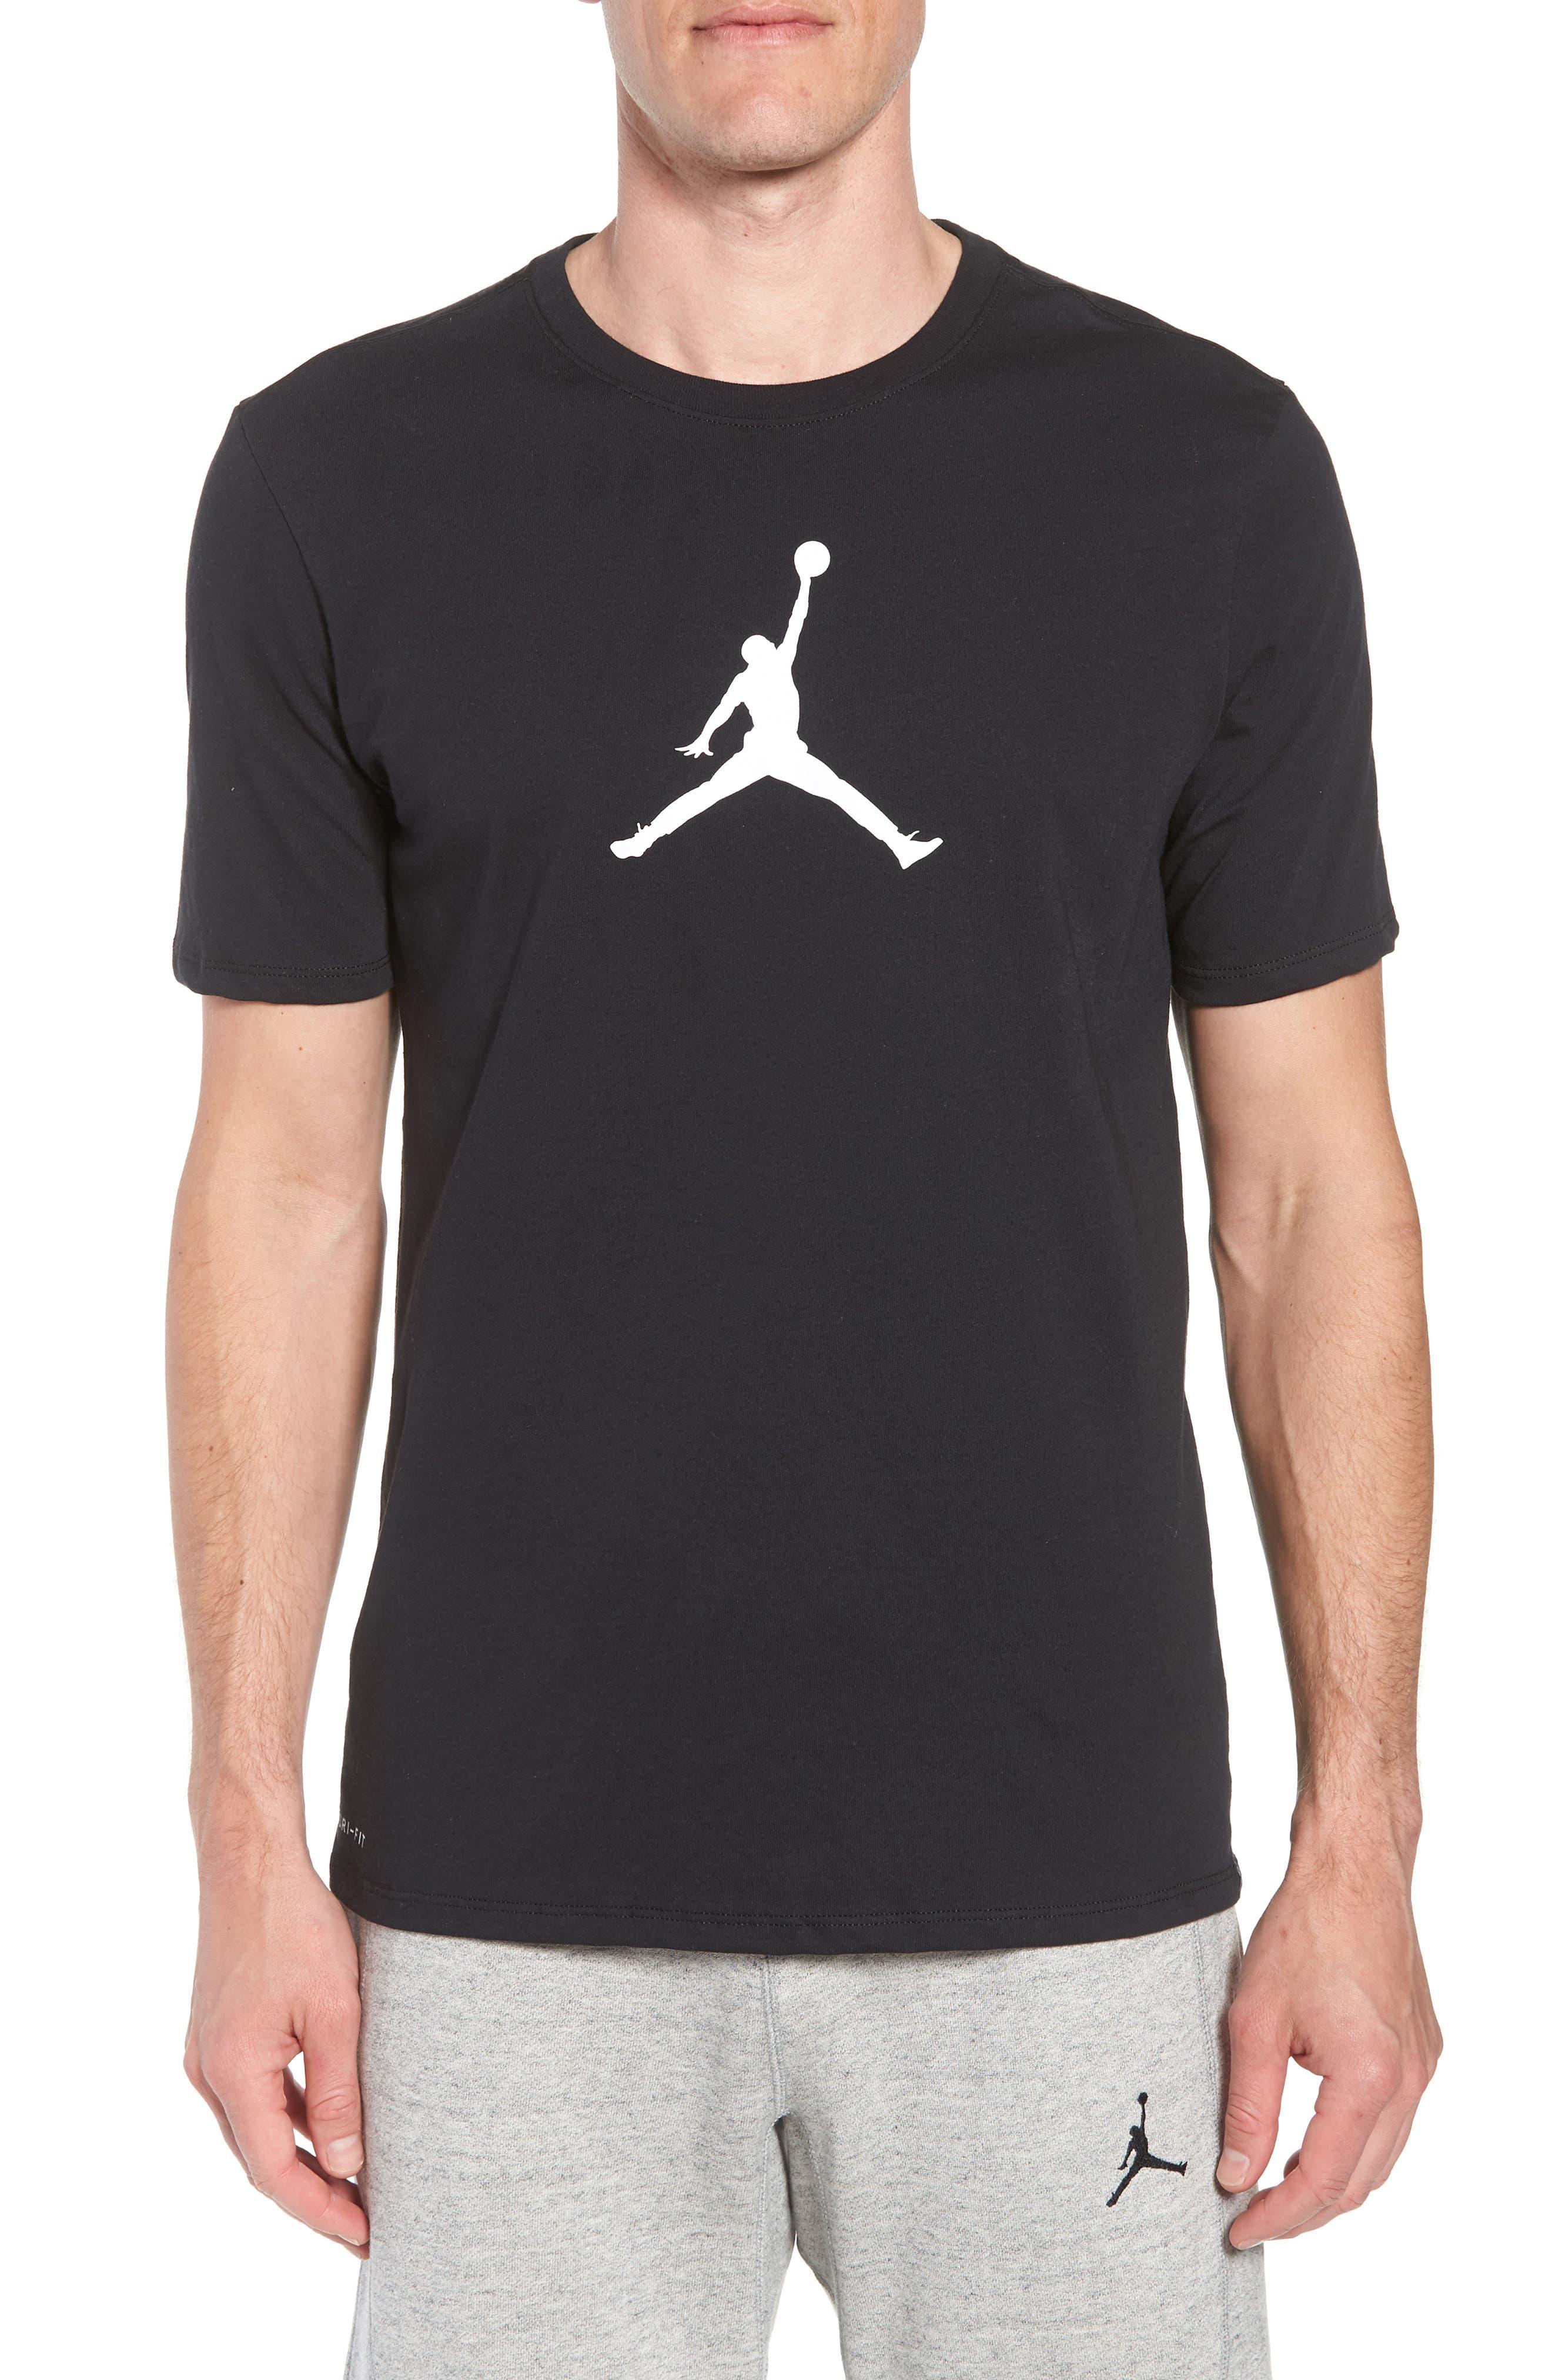 Iconic Jumpman Graphic T-Shirt,                             Main thumbnail 1, color,                             Black/ White